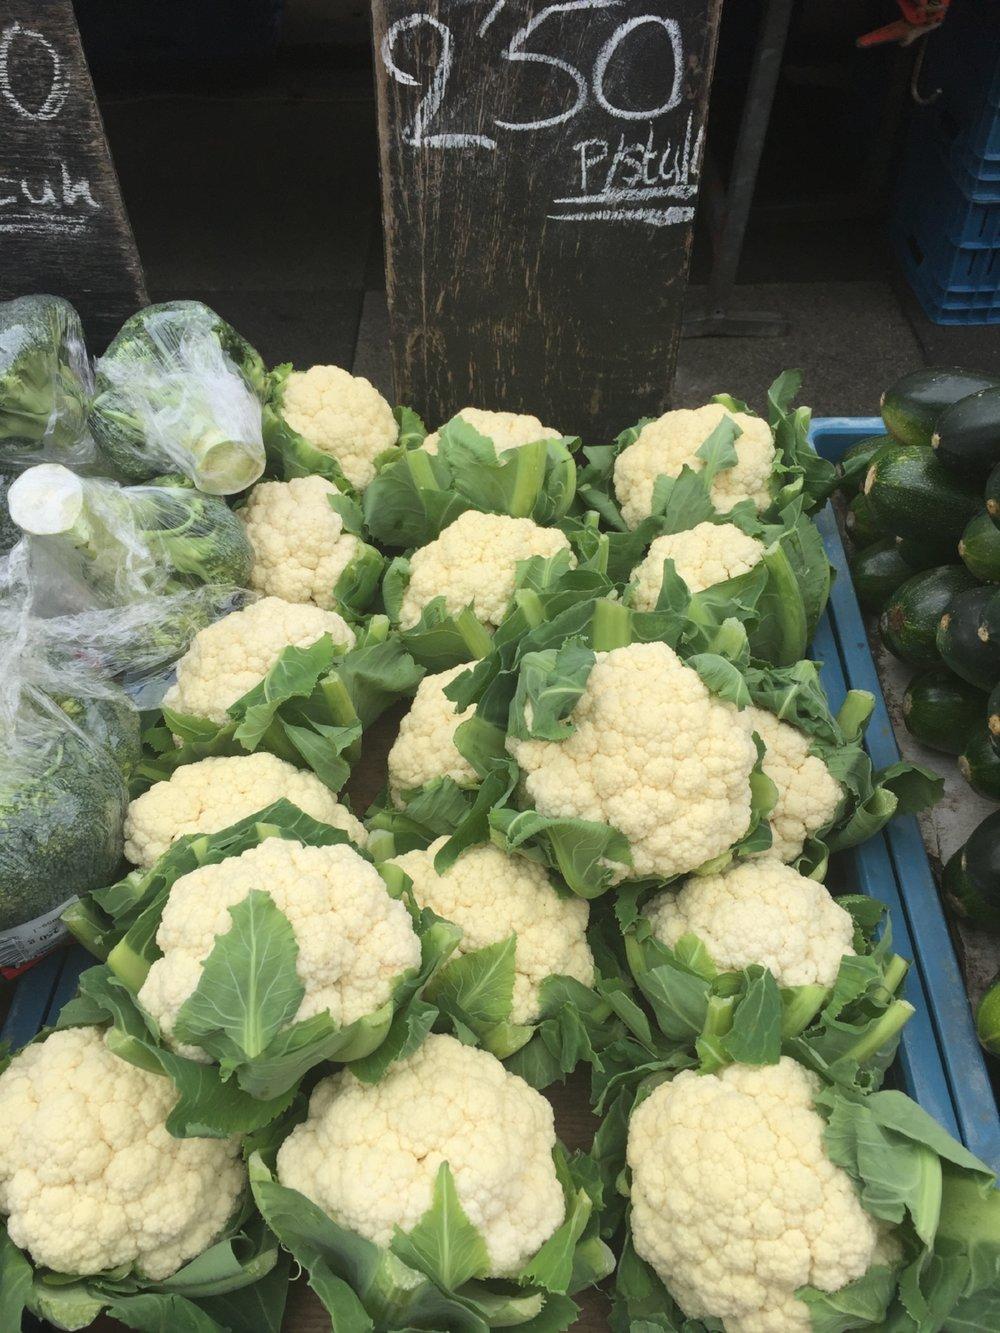 Fresh cauliflower at Albert Cuyp Market in Amsterdam